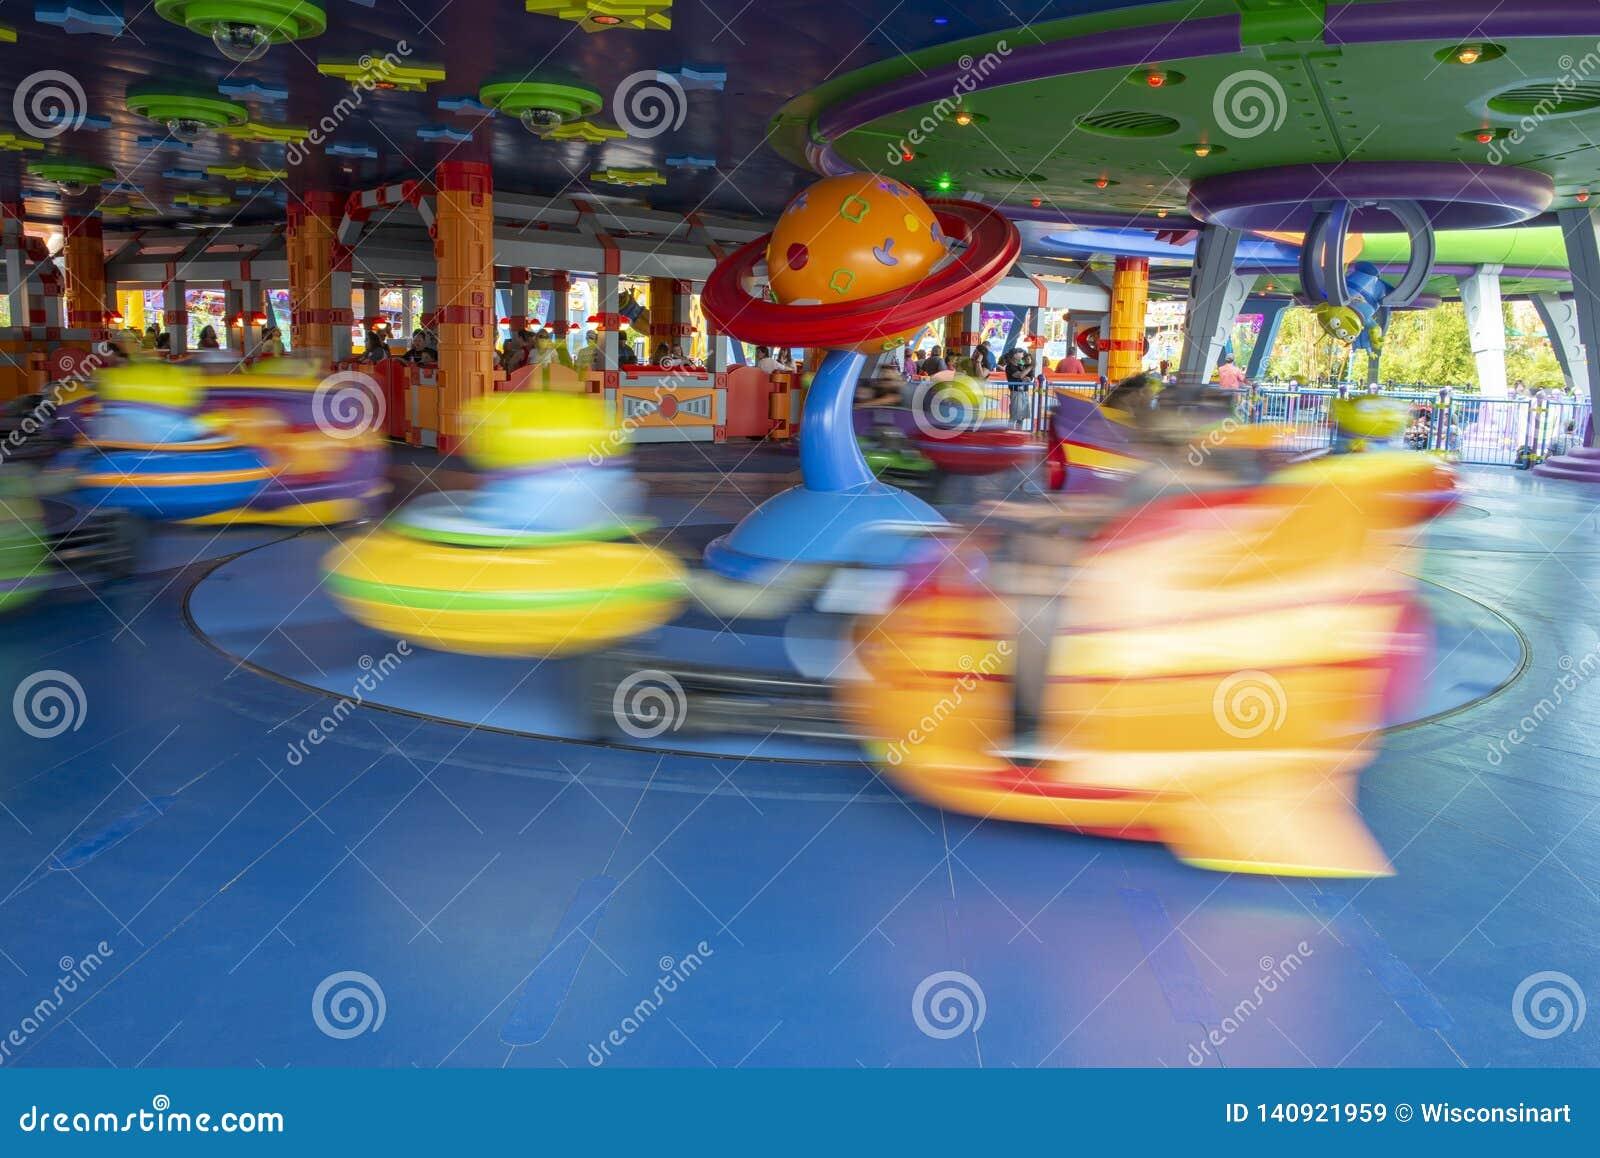 Toy Story Land, Disney World, Reis, Vreemde Schotels